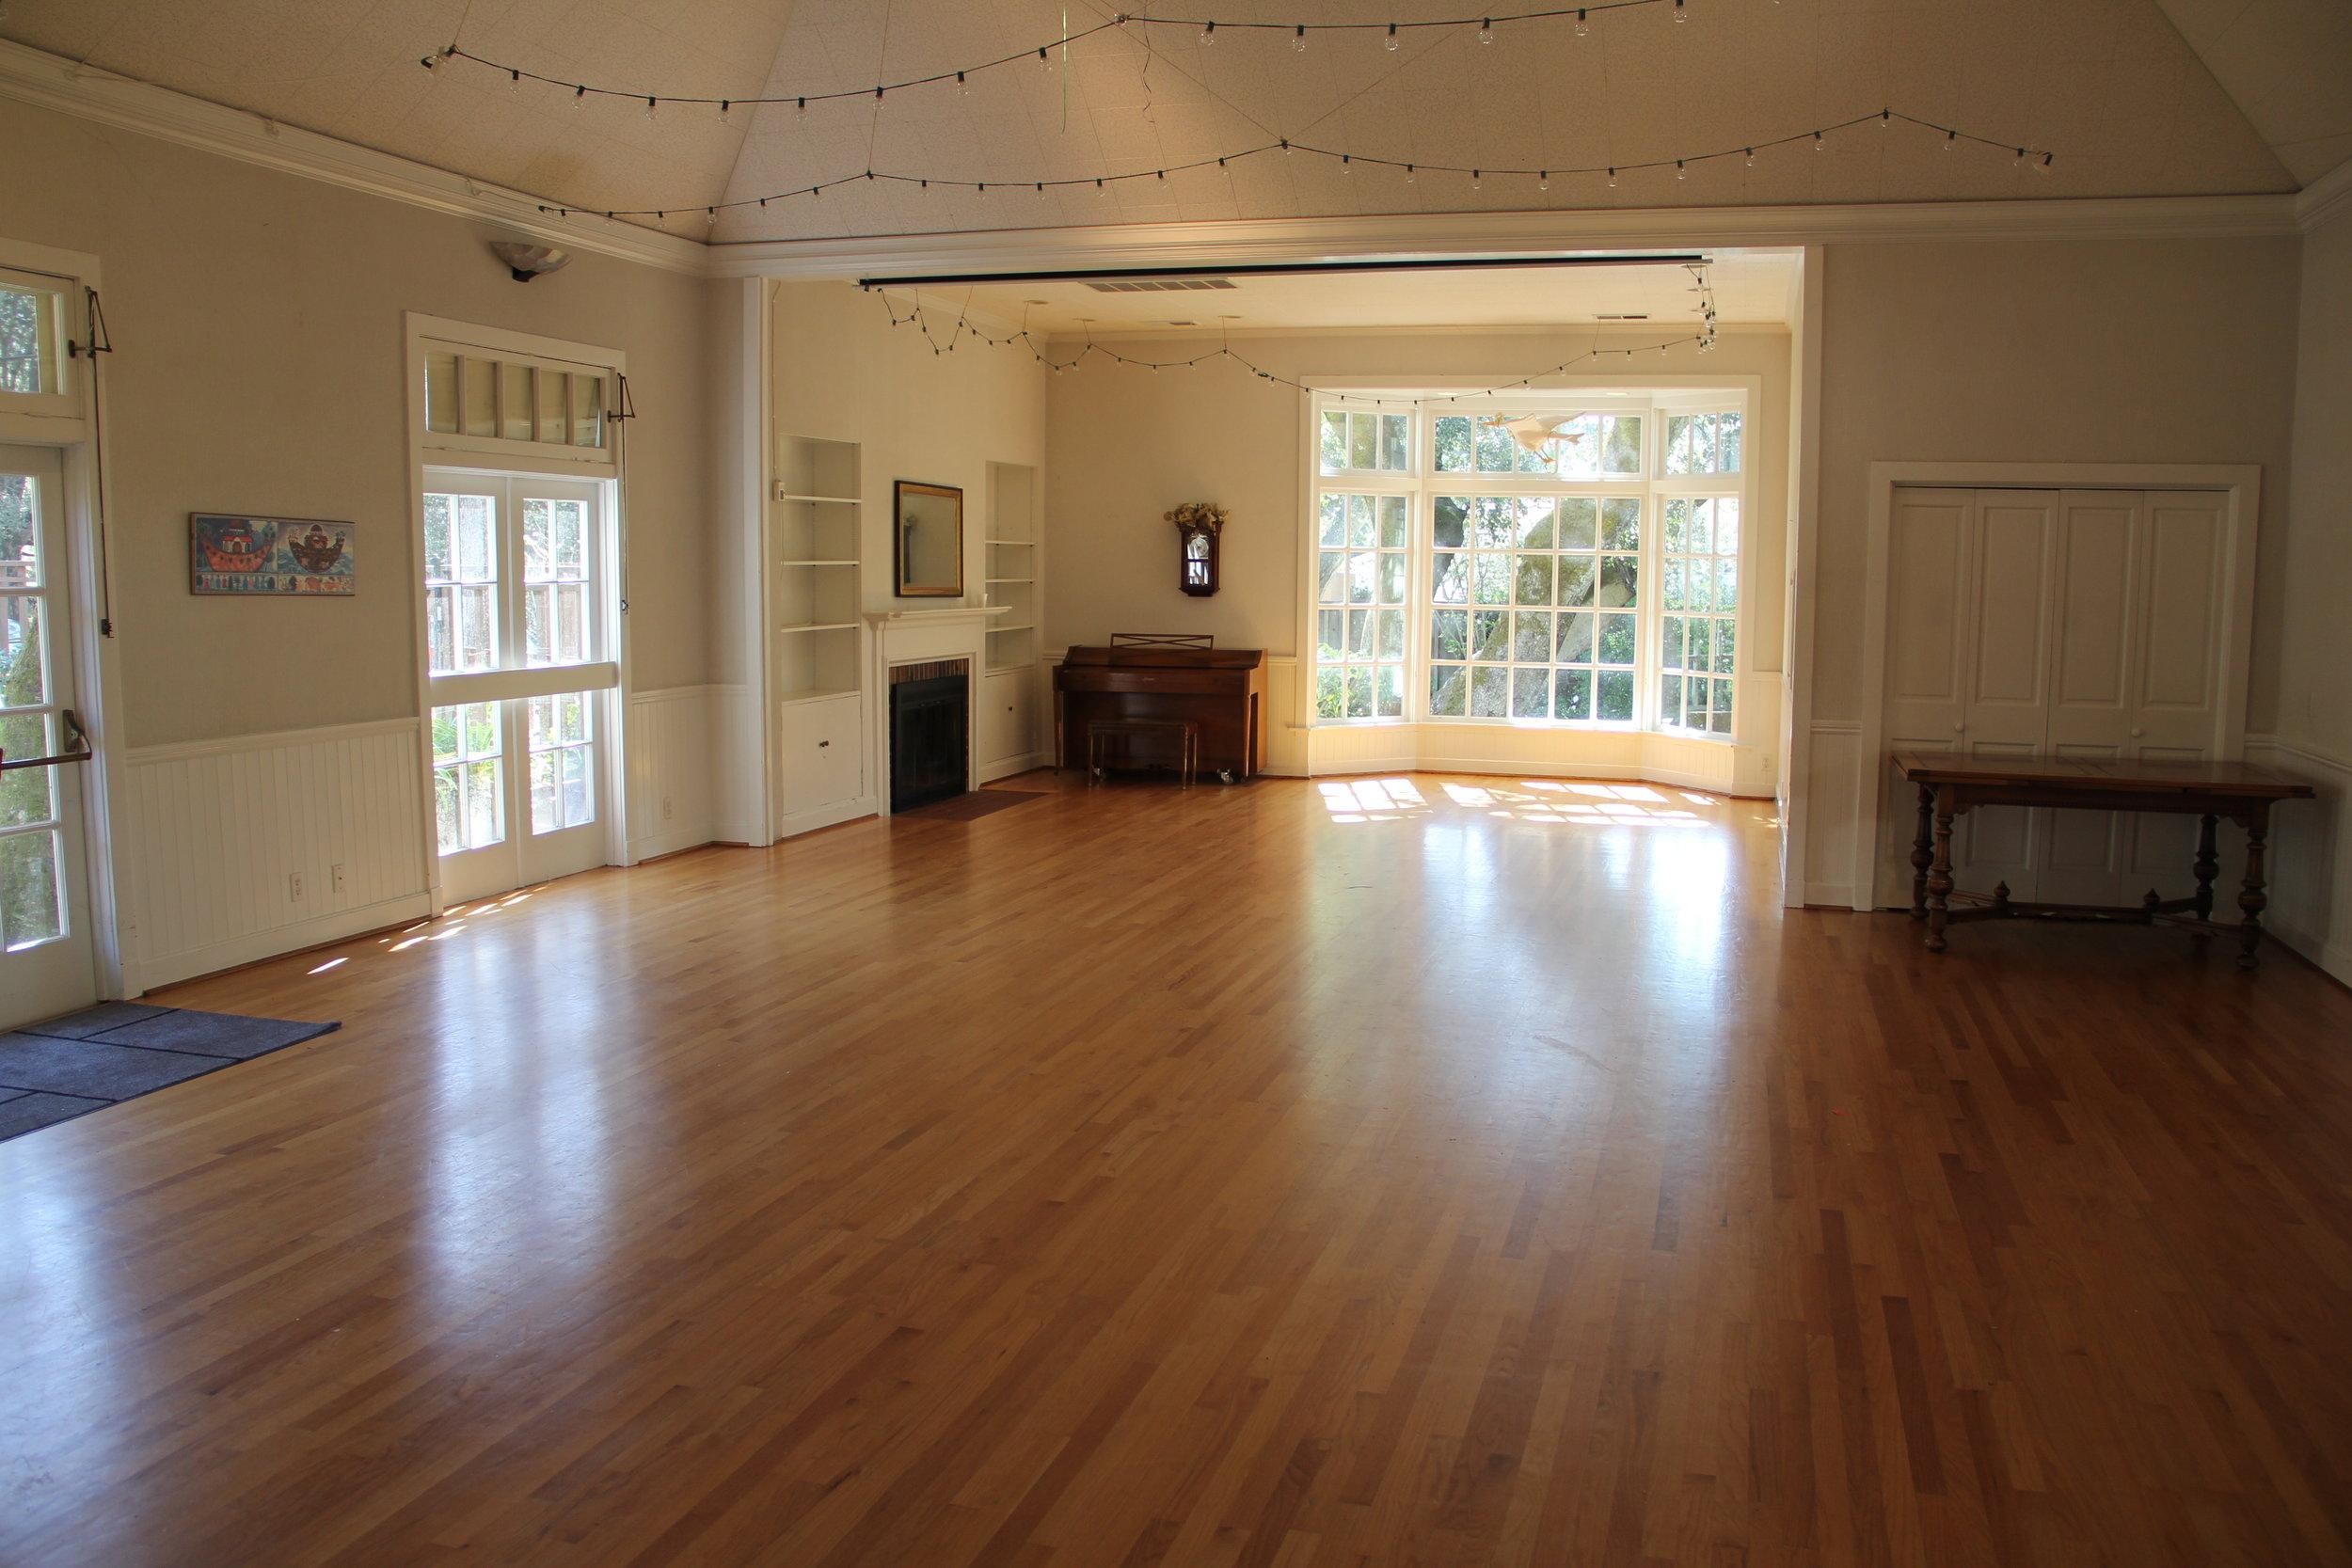 Guild Hall